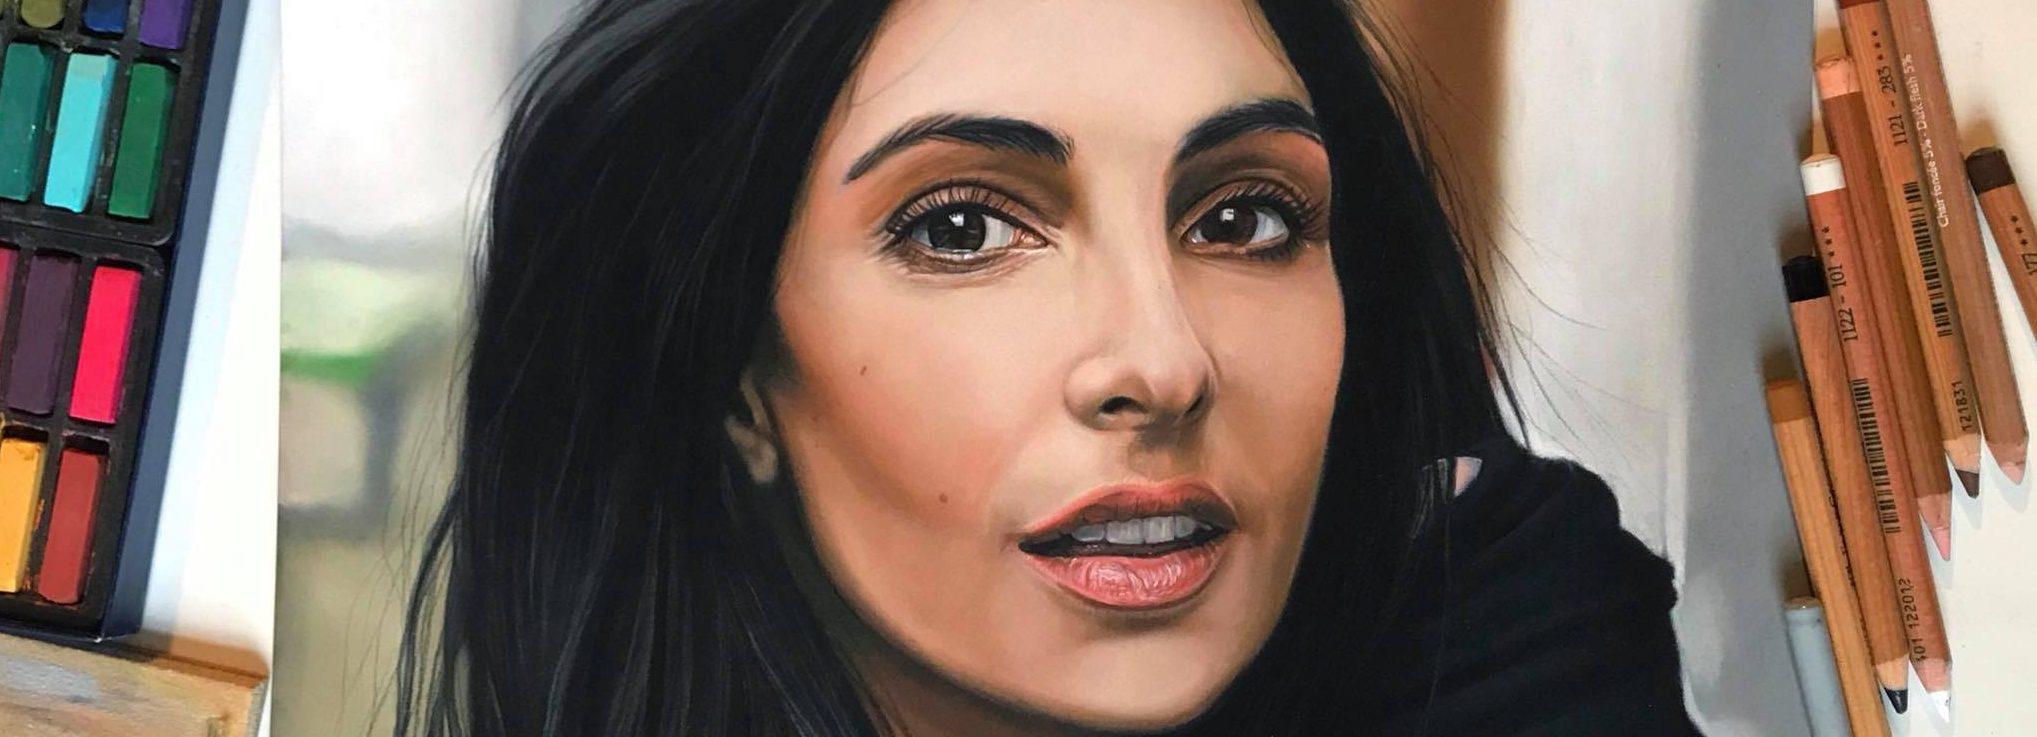 Portret tekenen in pastel